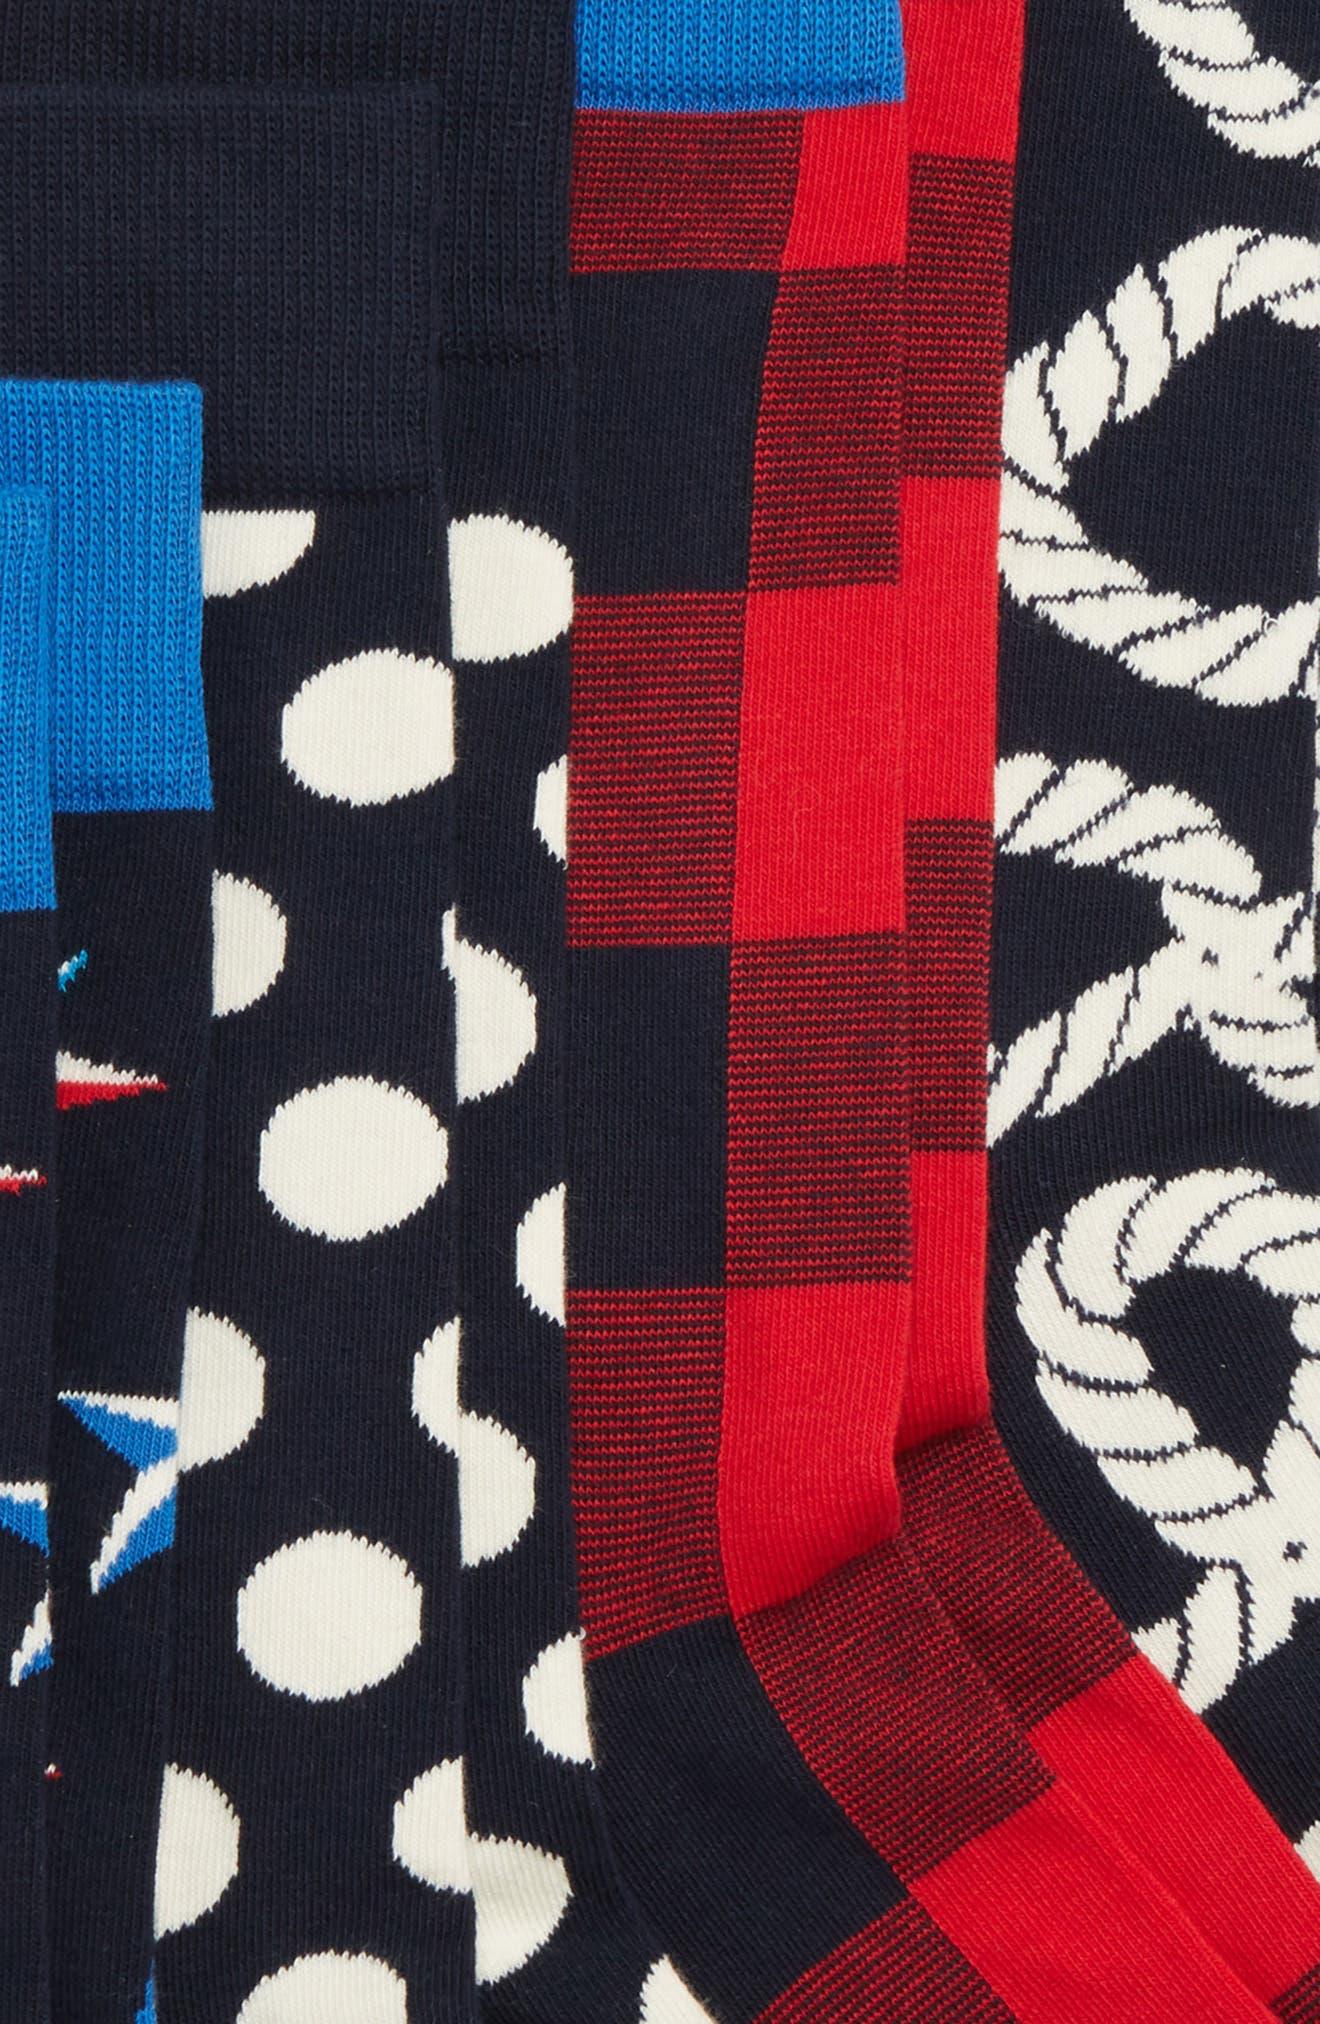 Nautical 4-Pack Box Set Socks,                             Alternate thumbnail 2, color,                             NAVY/ RED/ WHITE